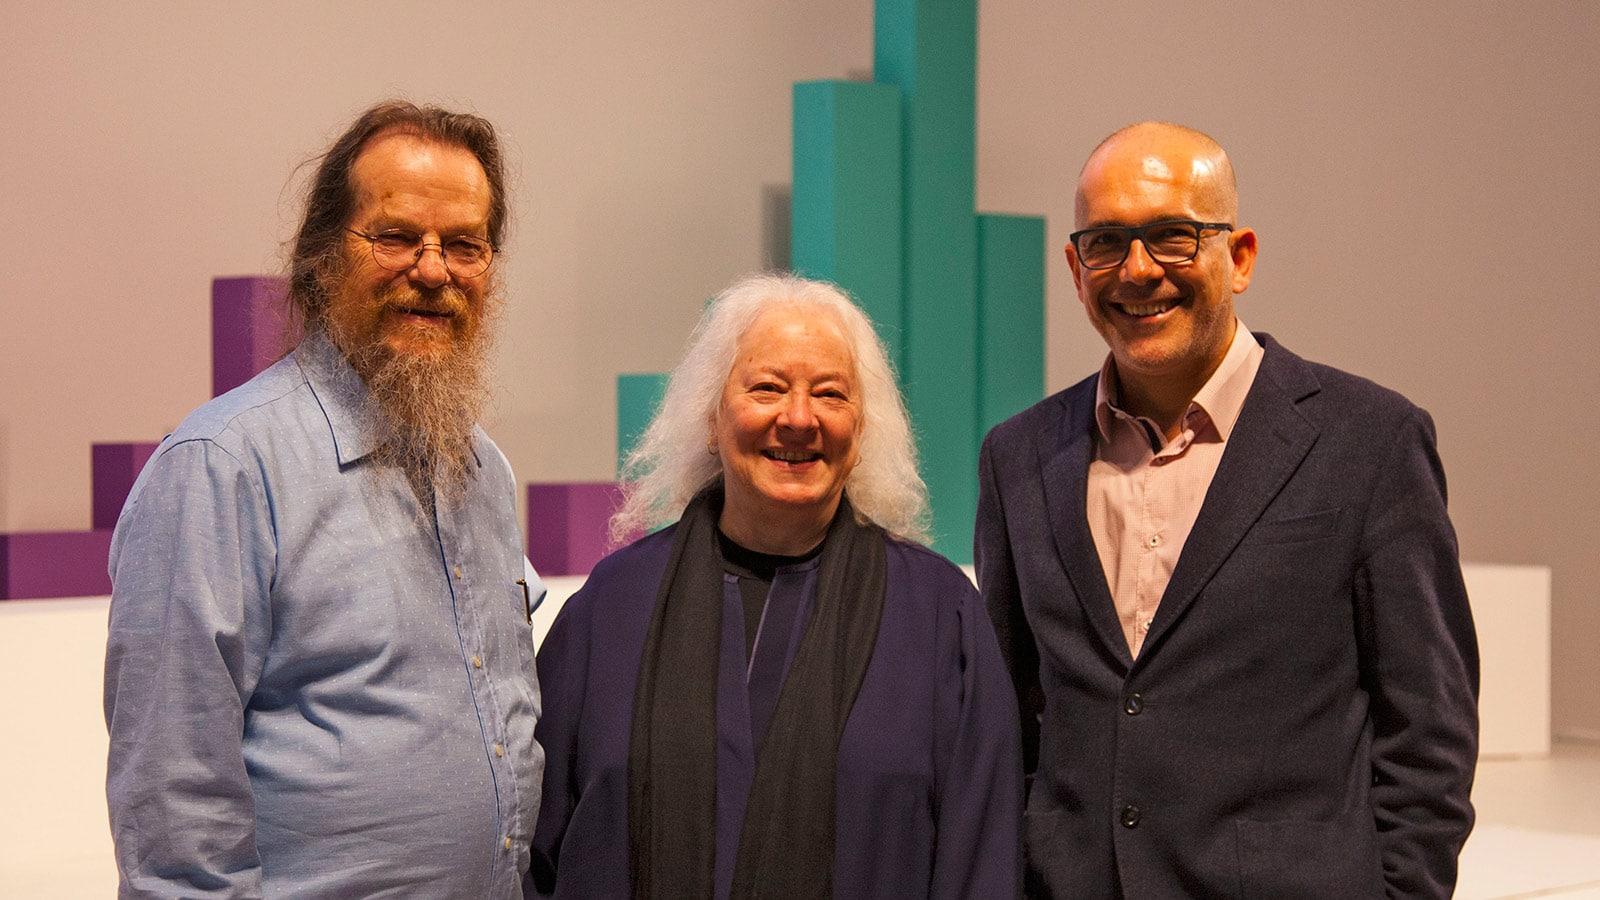 Left to Right – John Meyer, Helen Meyer, Pedro Gadanho, Director of MAAT